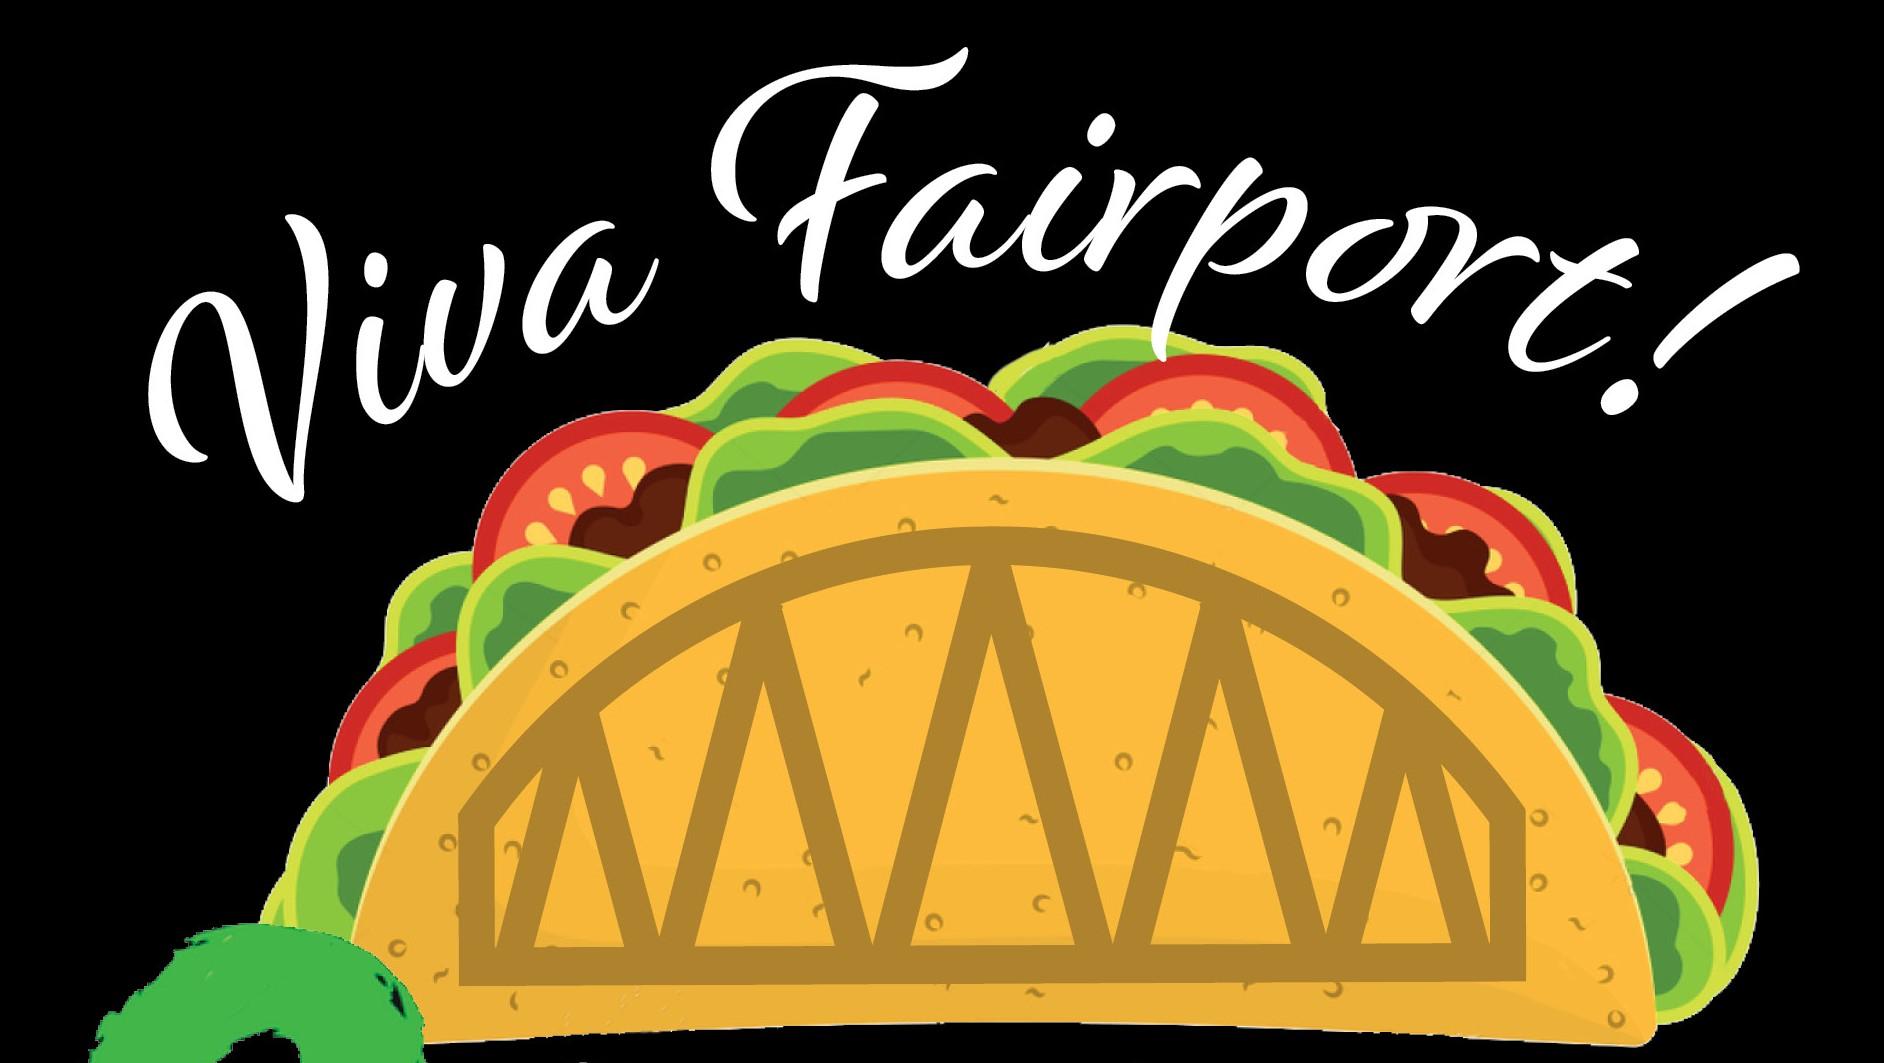 Cinco Viva Fairport.jpg